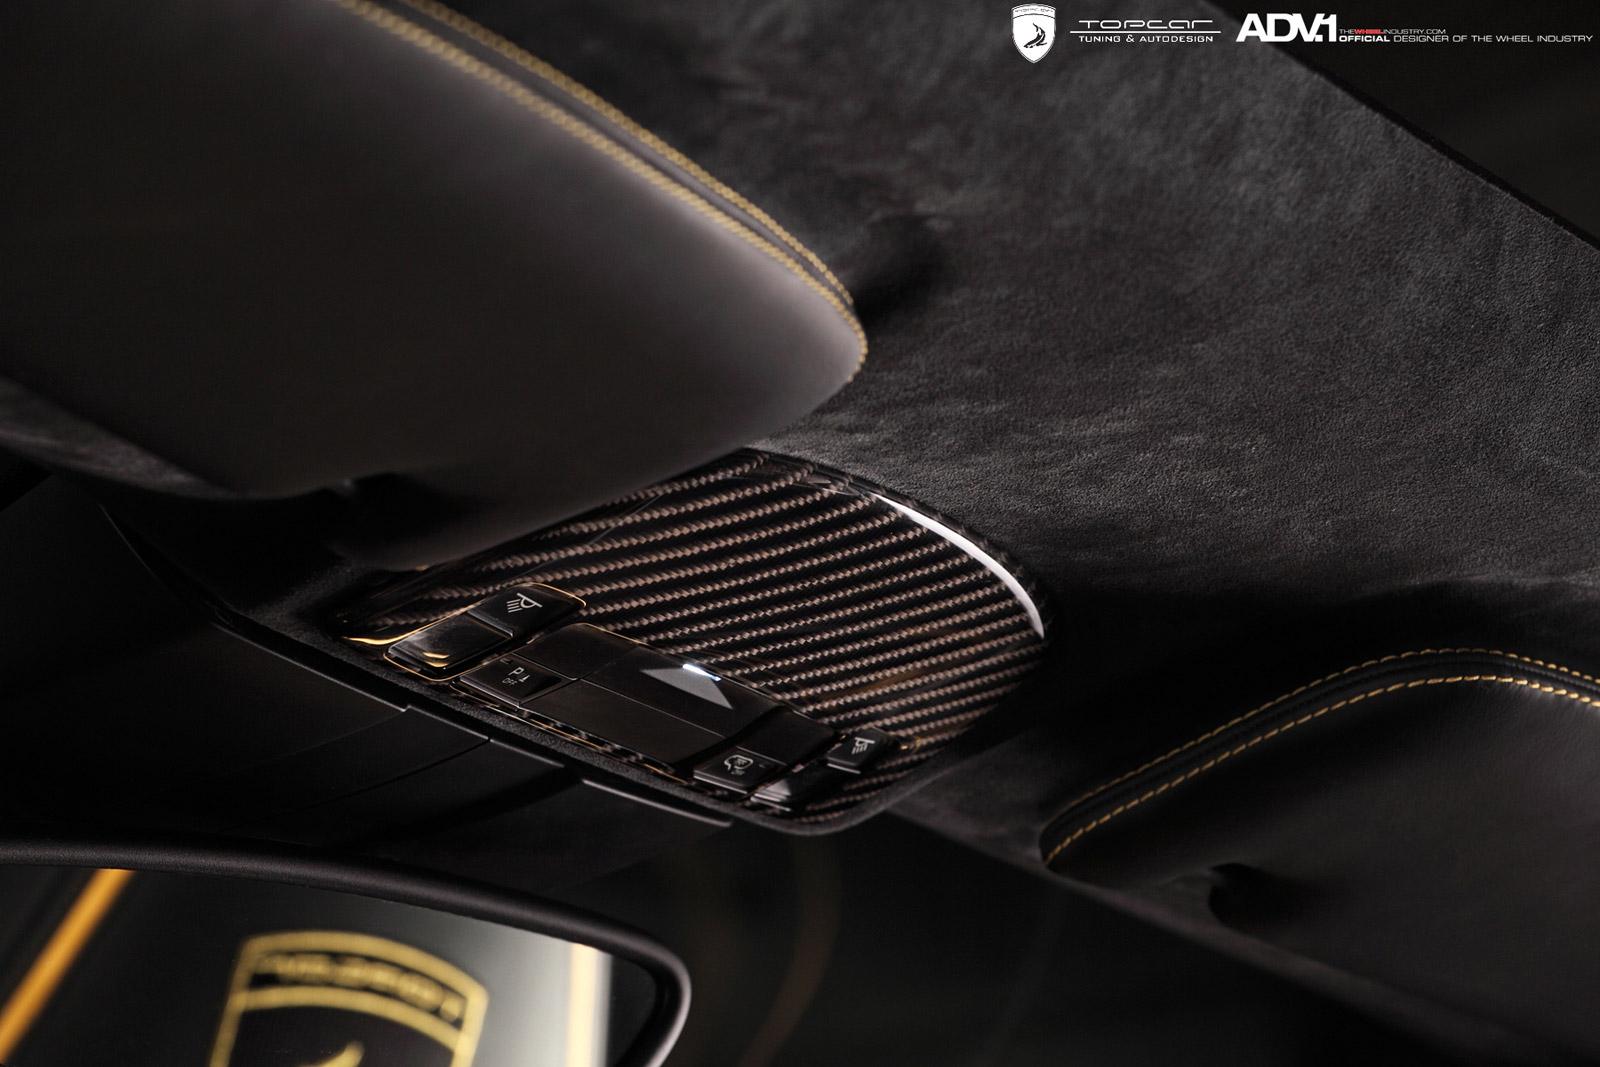 porsche-911-turbo-typ-991-topcar-stinger-gtr-036